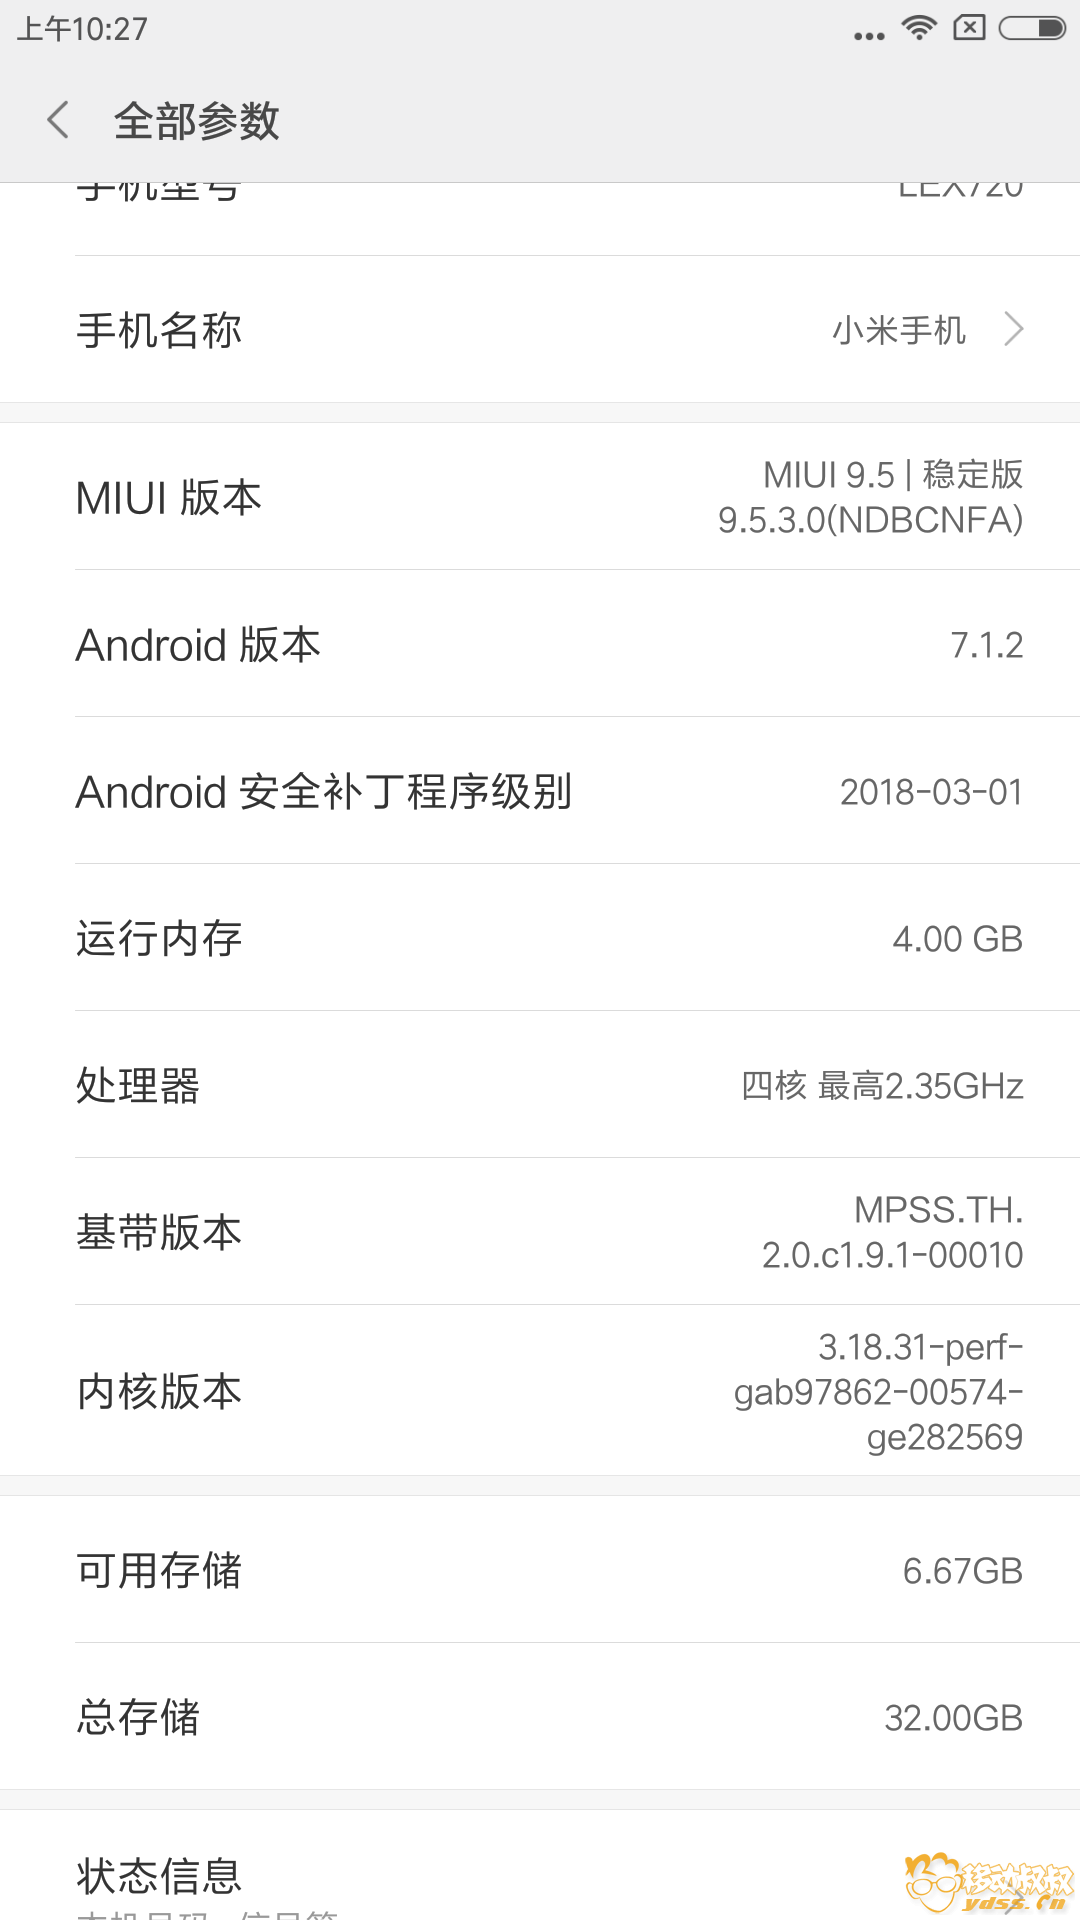 Screenshot_2018-06-16-10-27-07-873_com.android.settings.png